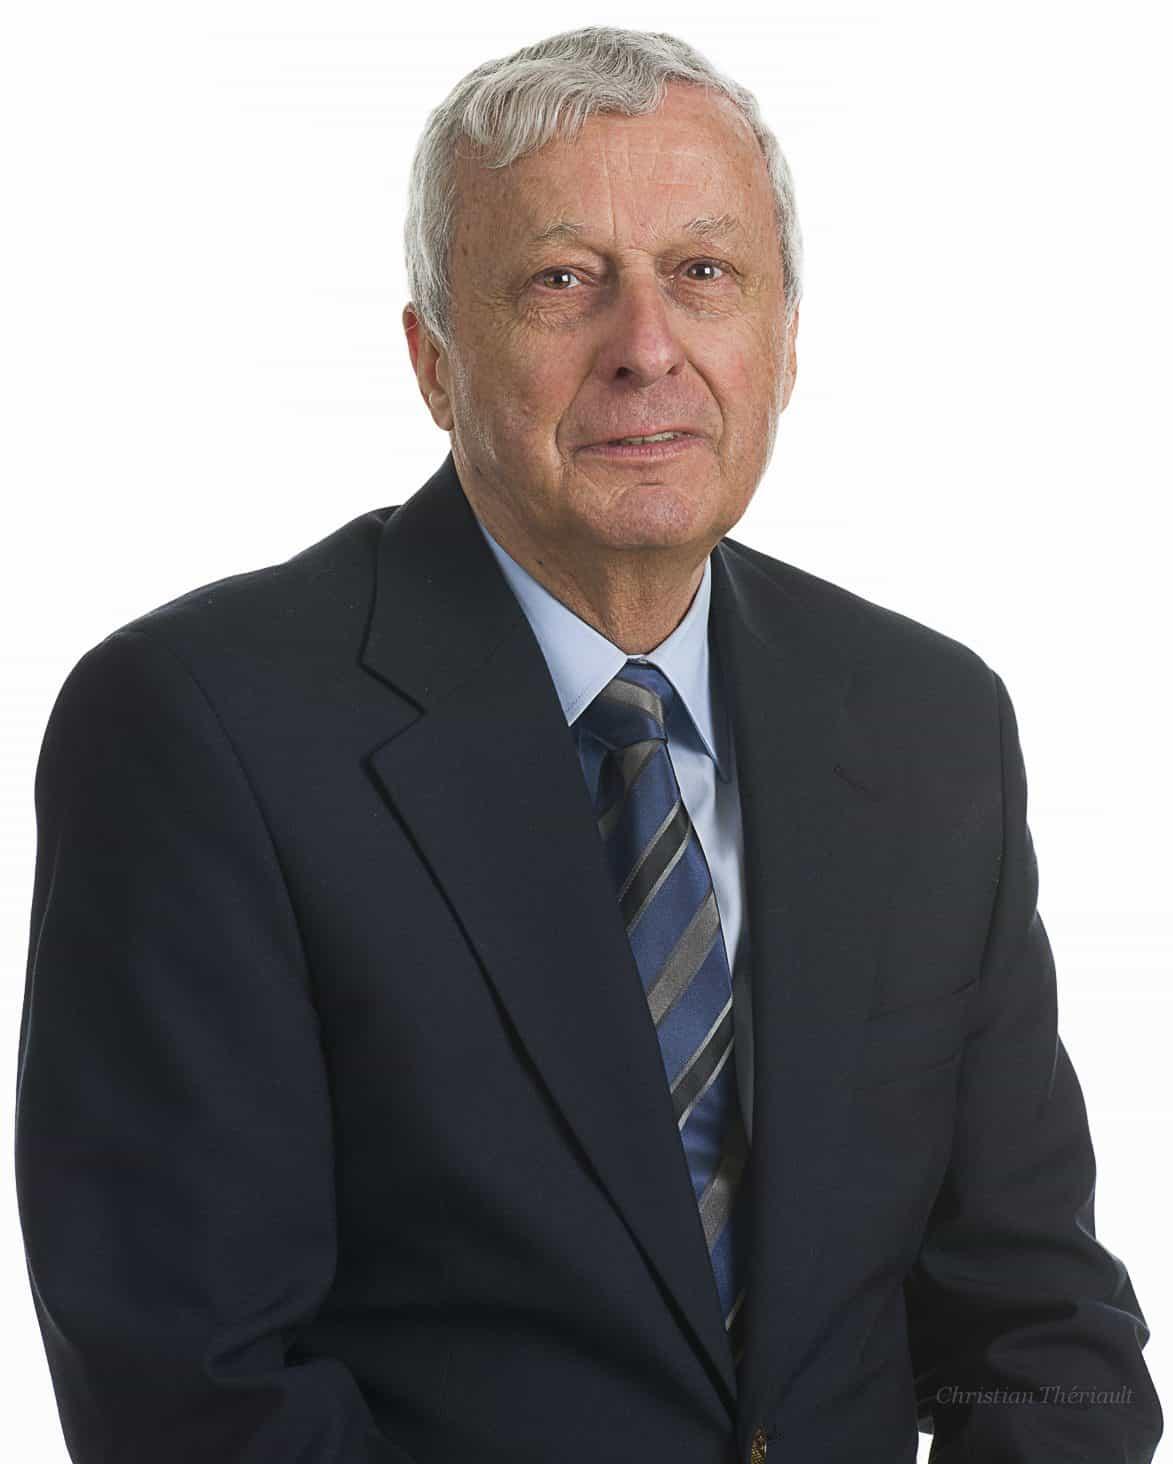 Réjean Pelletier, Conseiller, siège 3